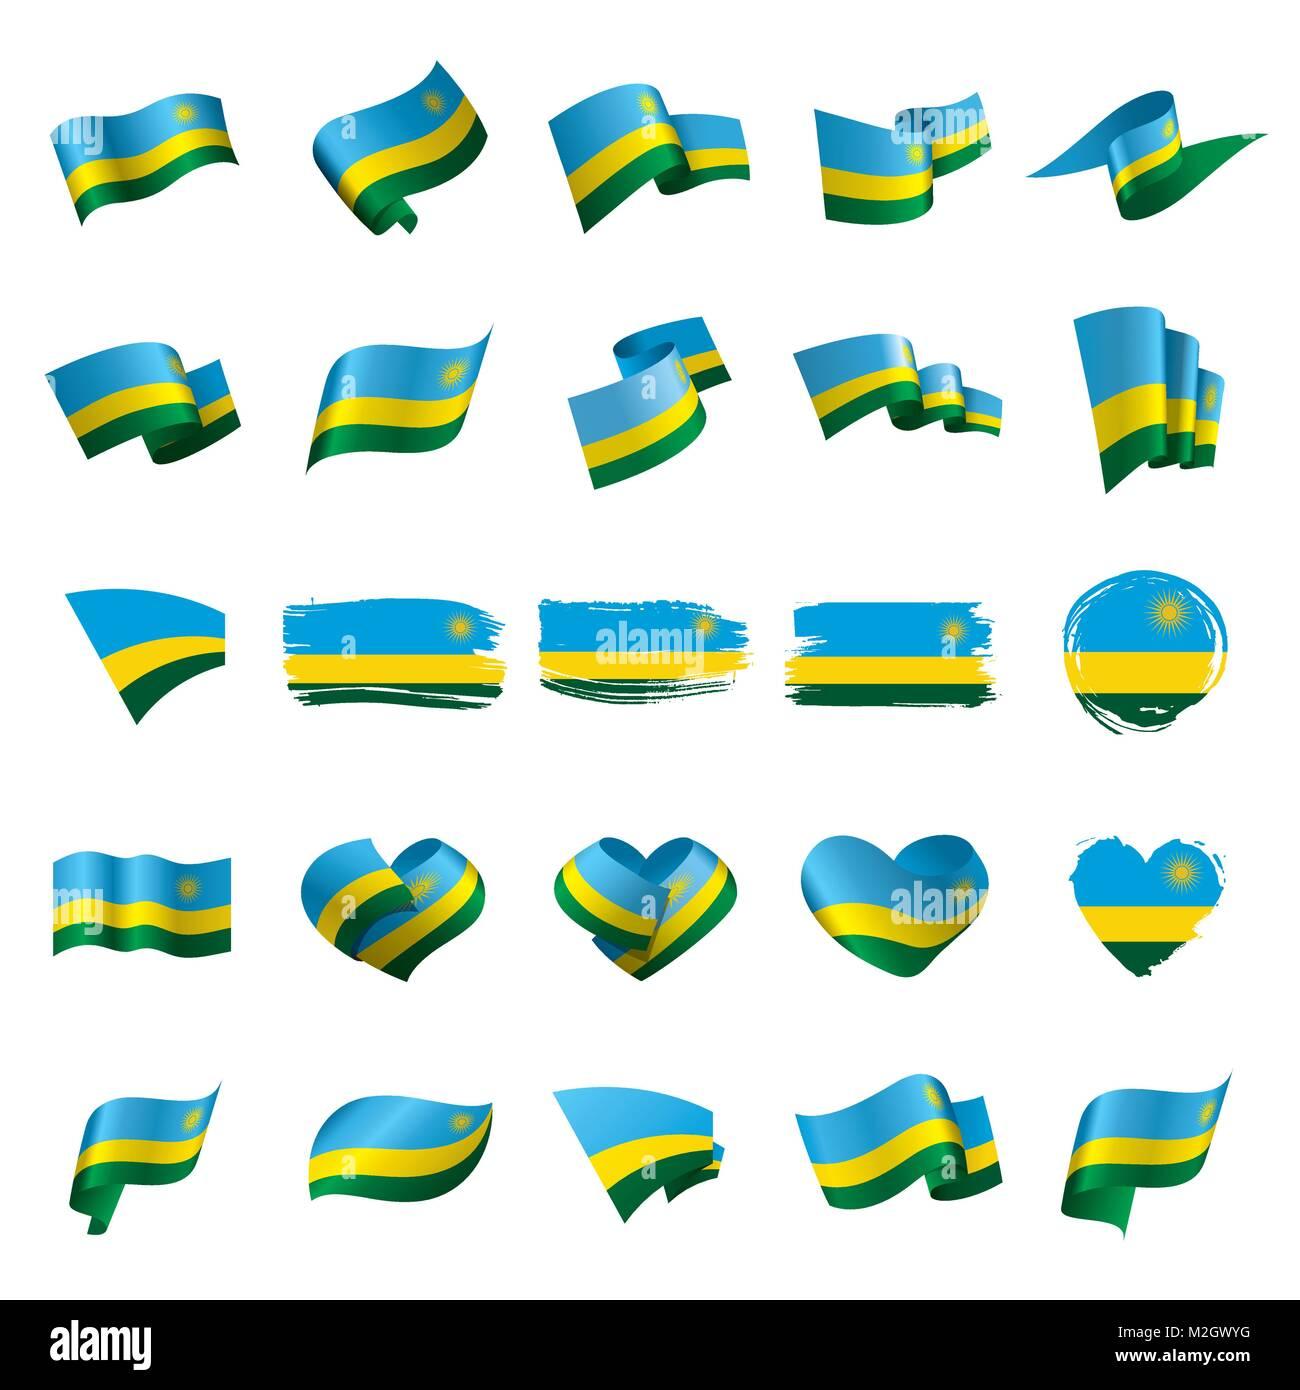 Rwanda flag, vector illustration - Stock Image